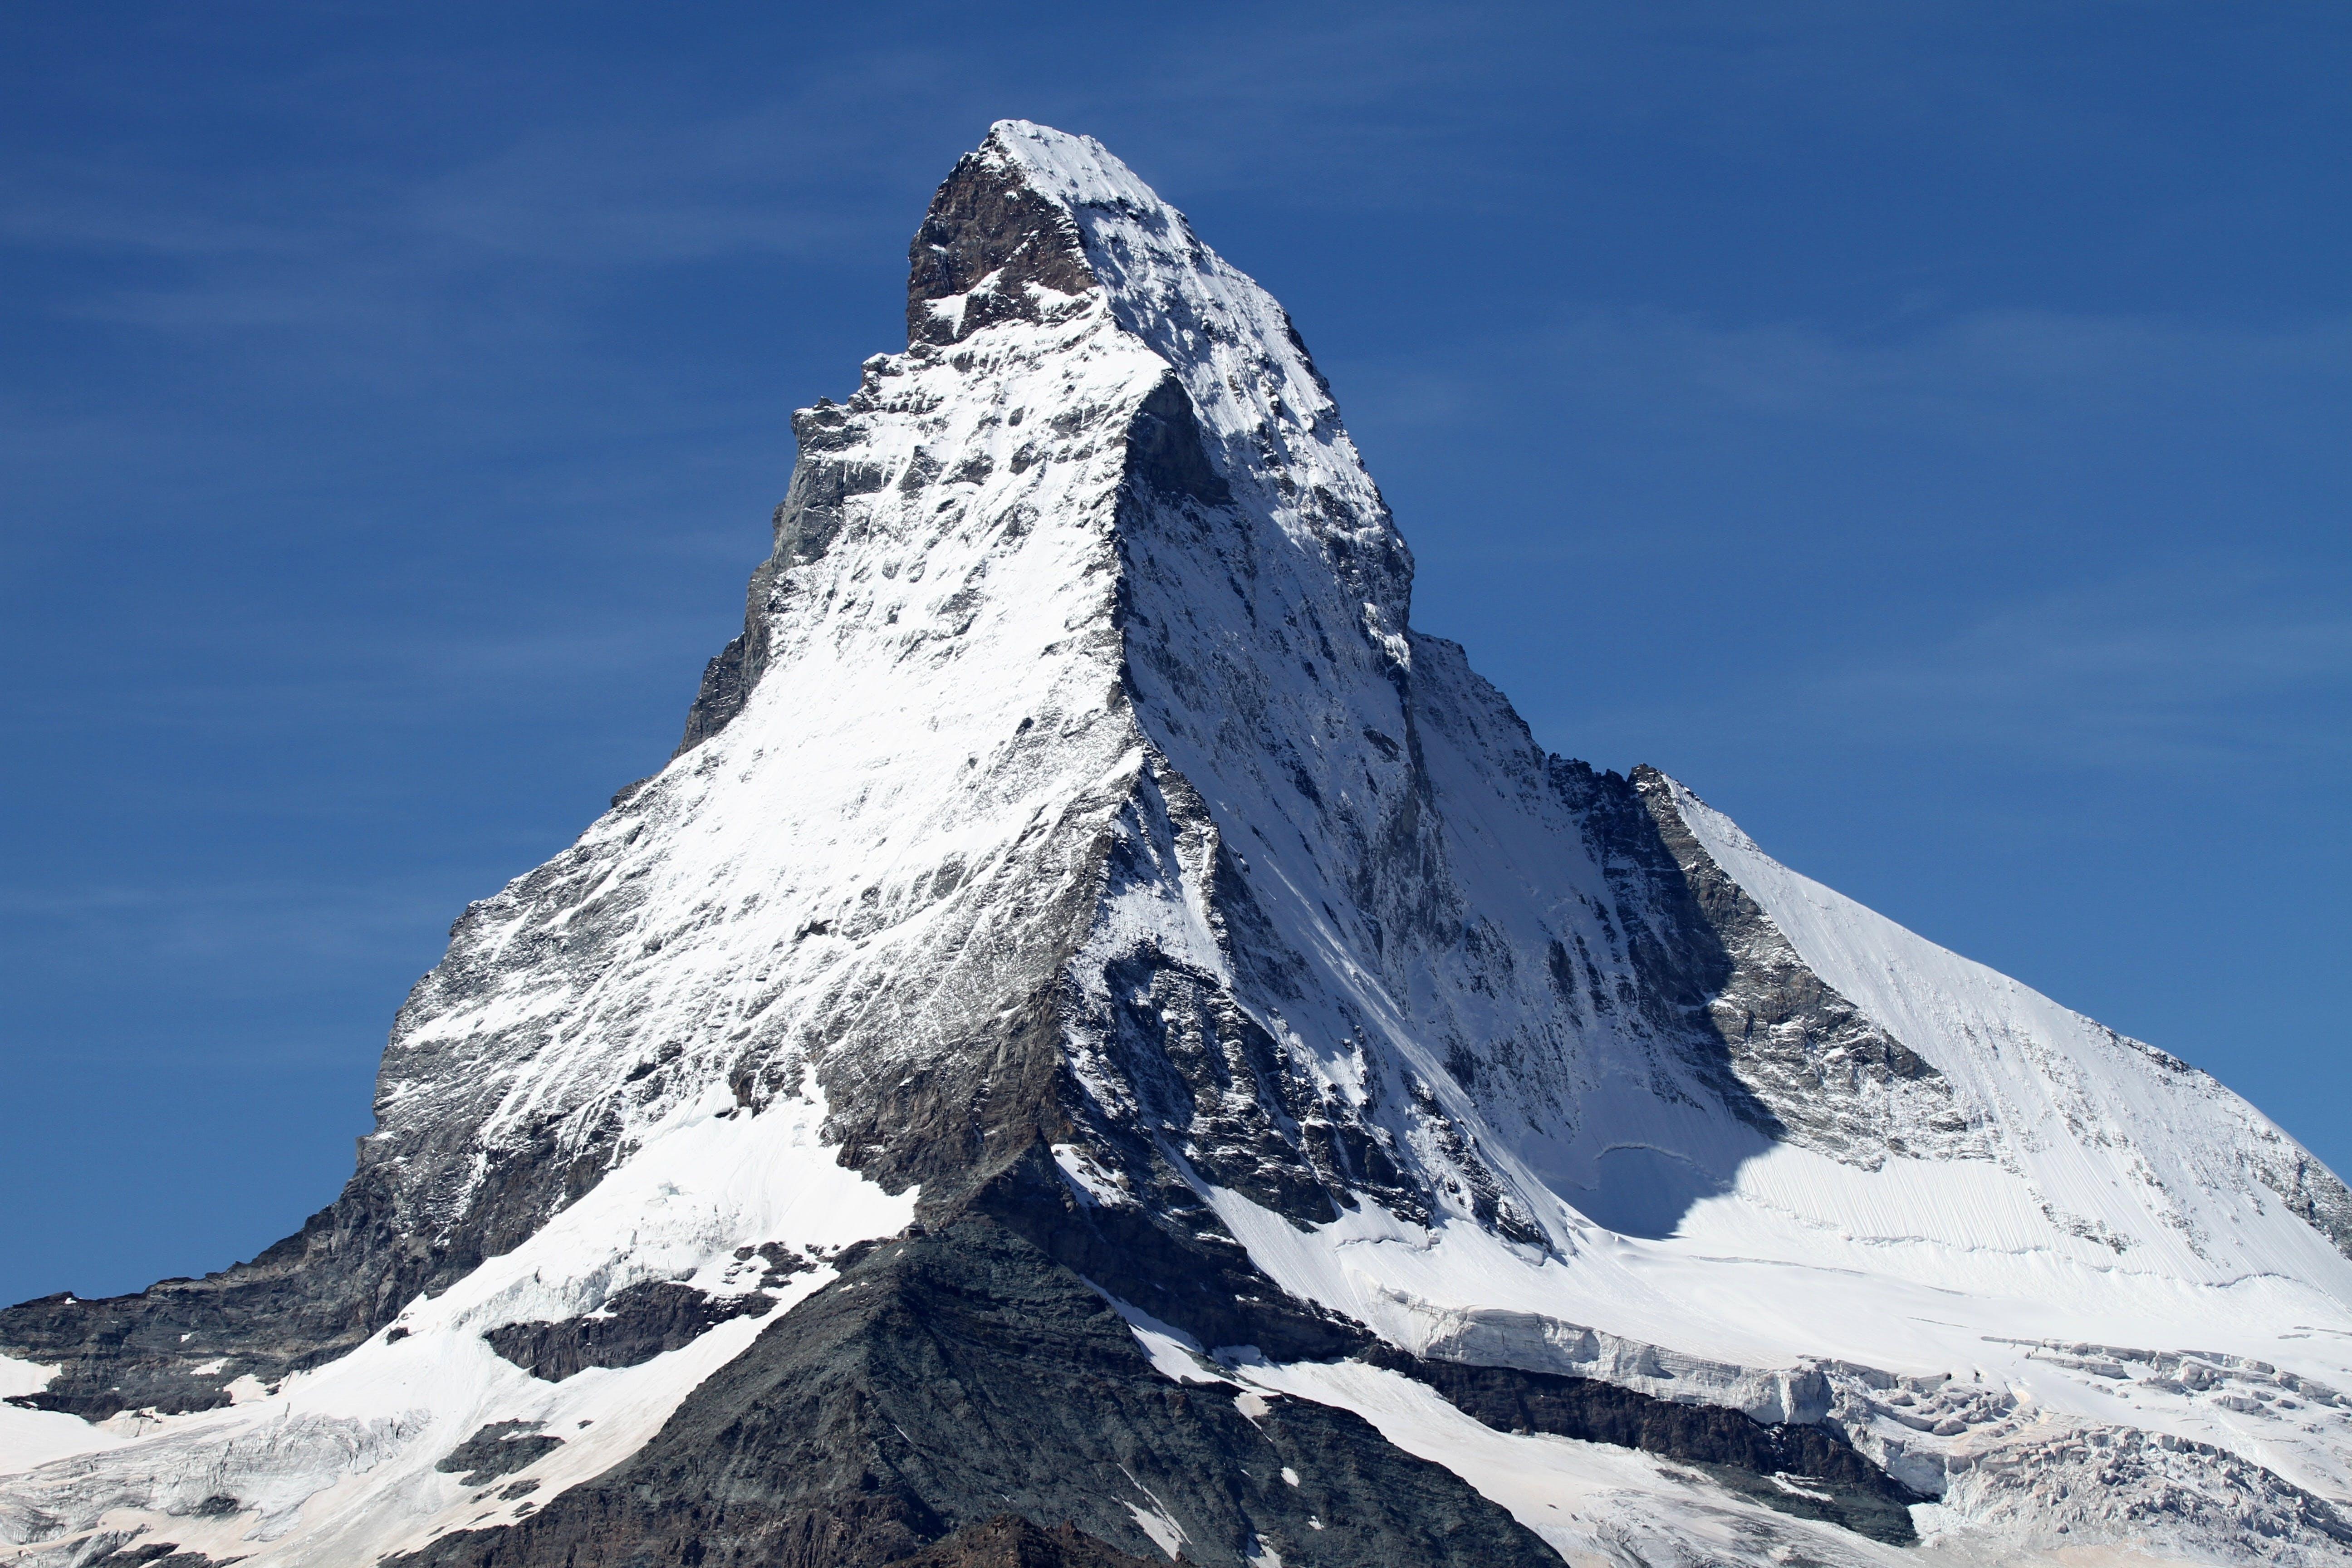 Kostenloses Stock Foto zu berg, felsiger berg, gipfel, himmel